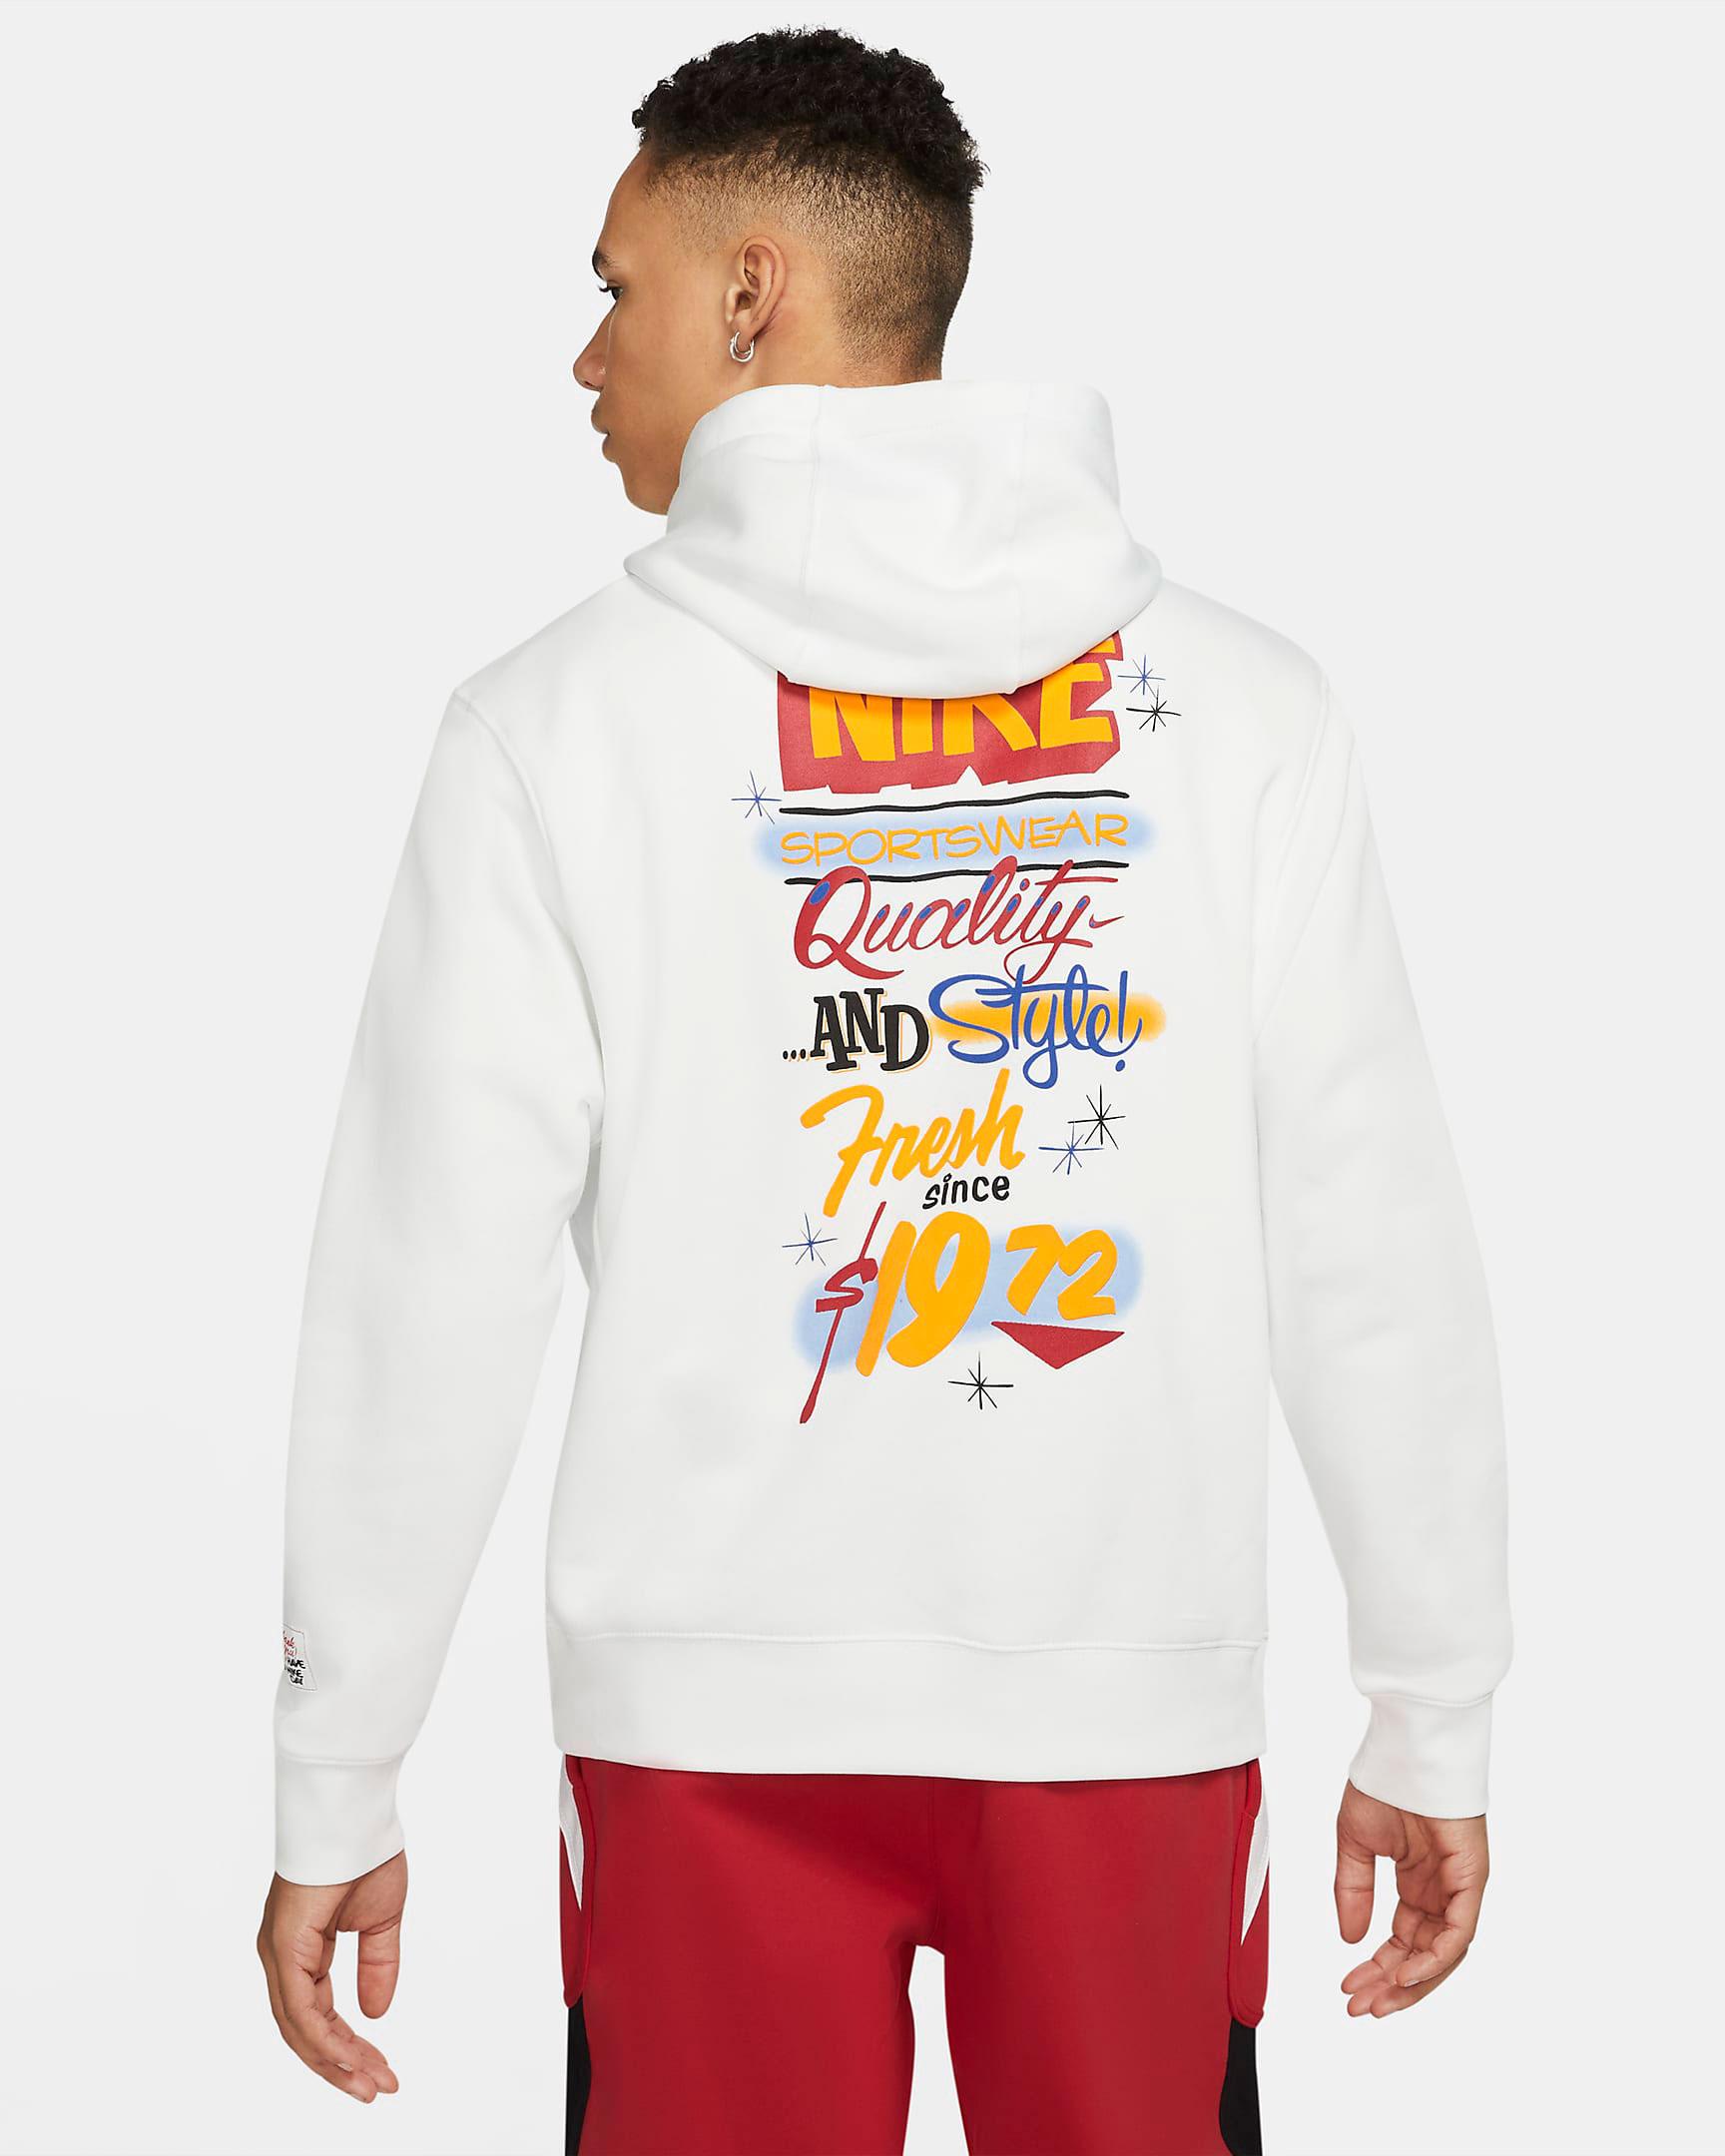 nike-dunk-low-city-market-hoodie-2